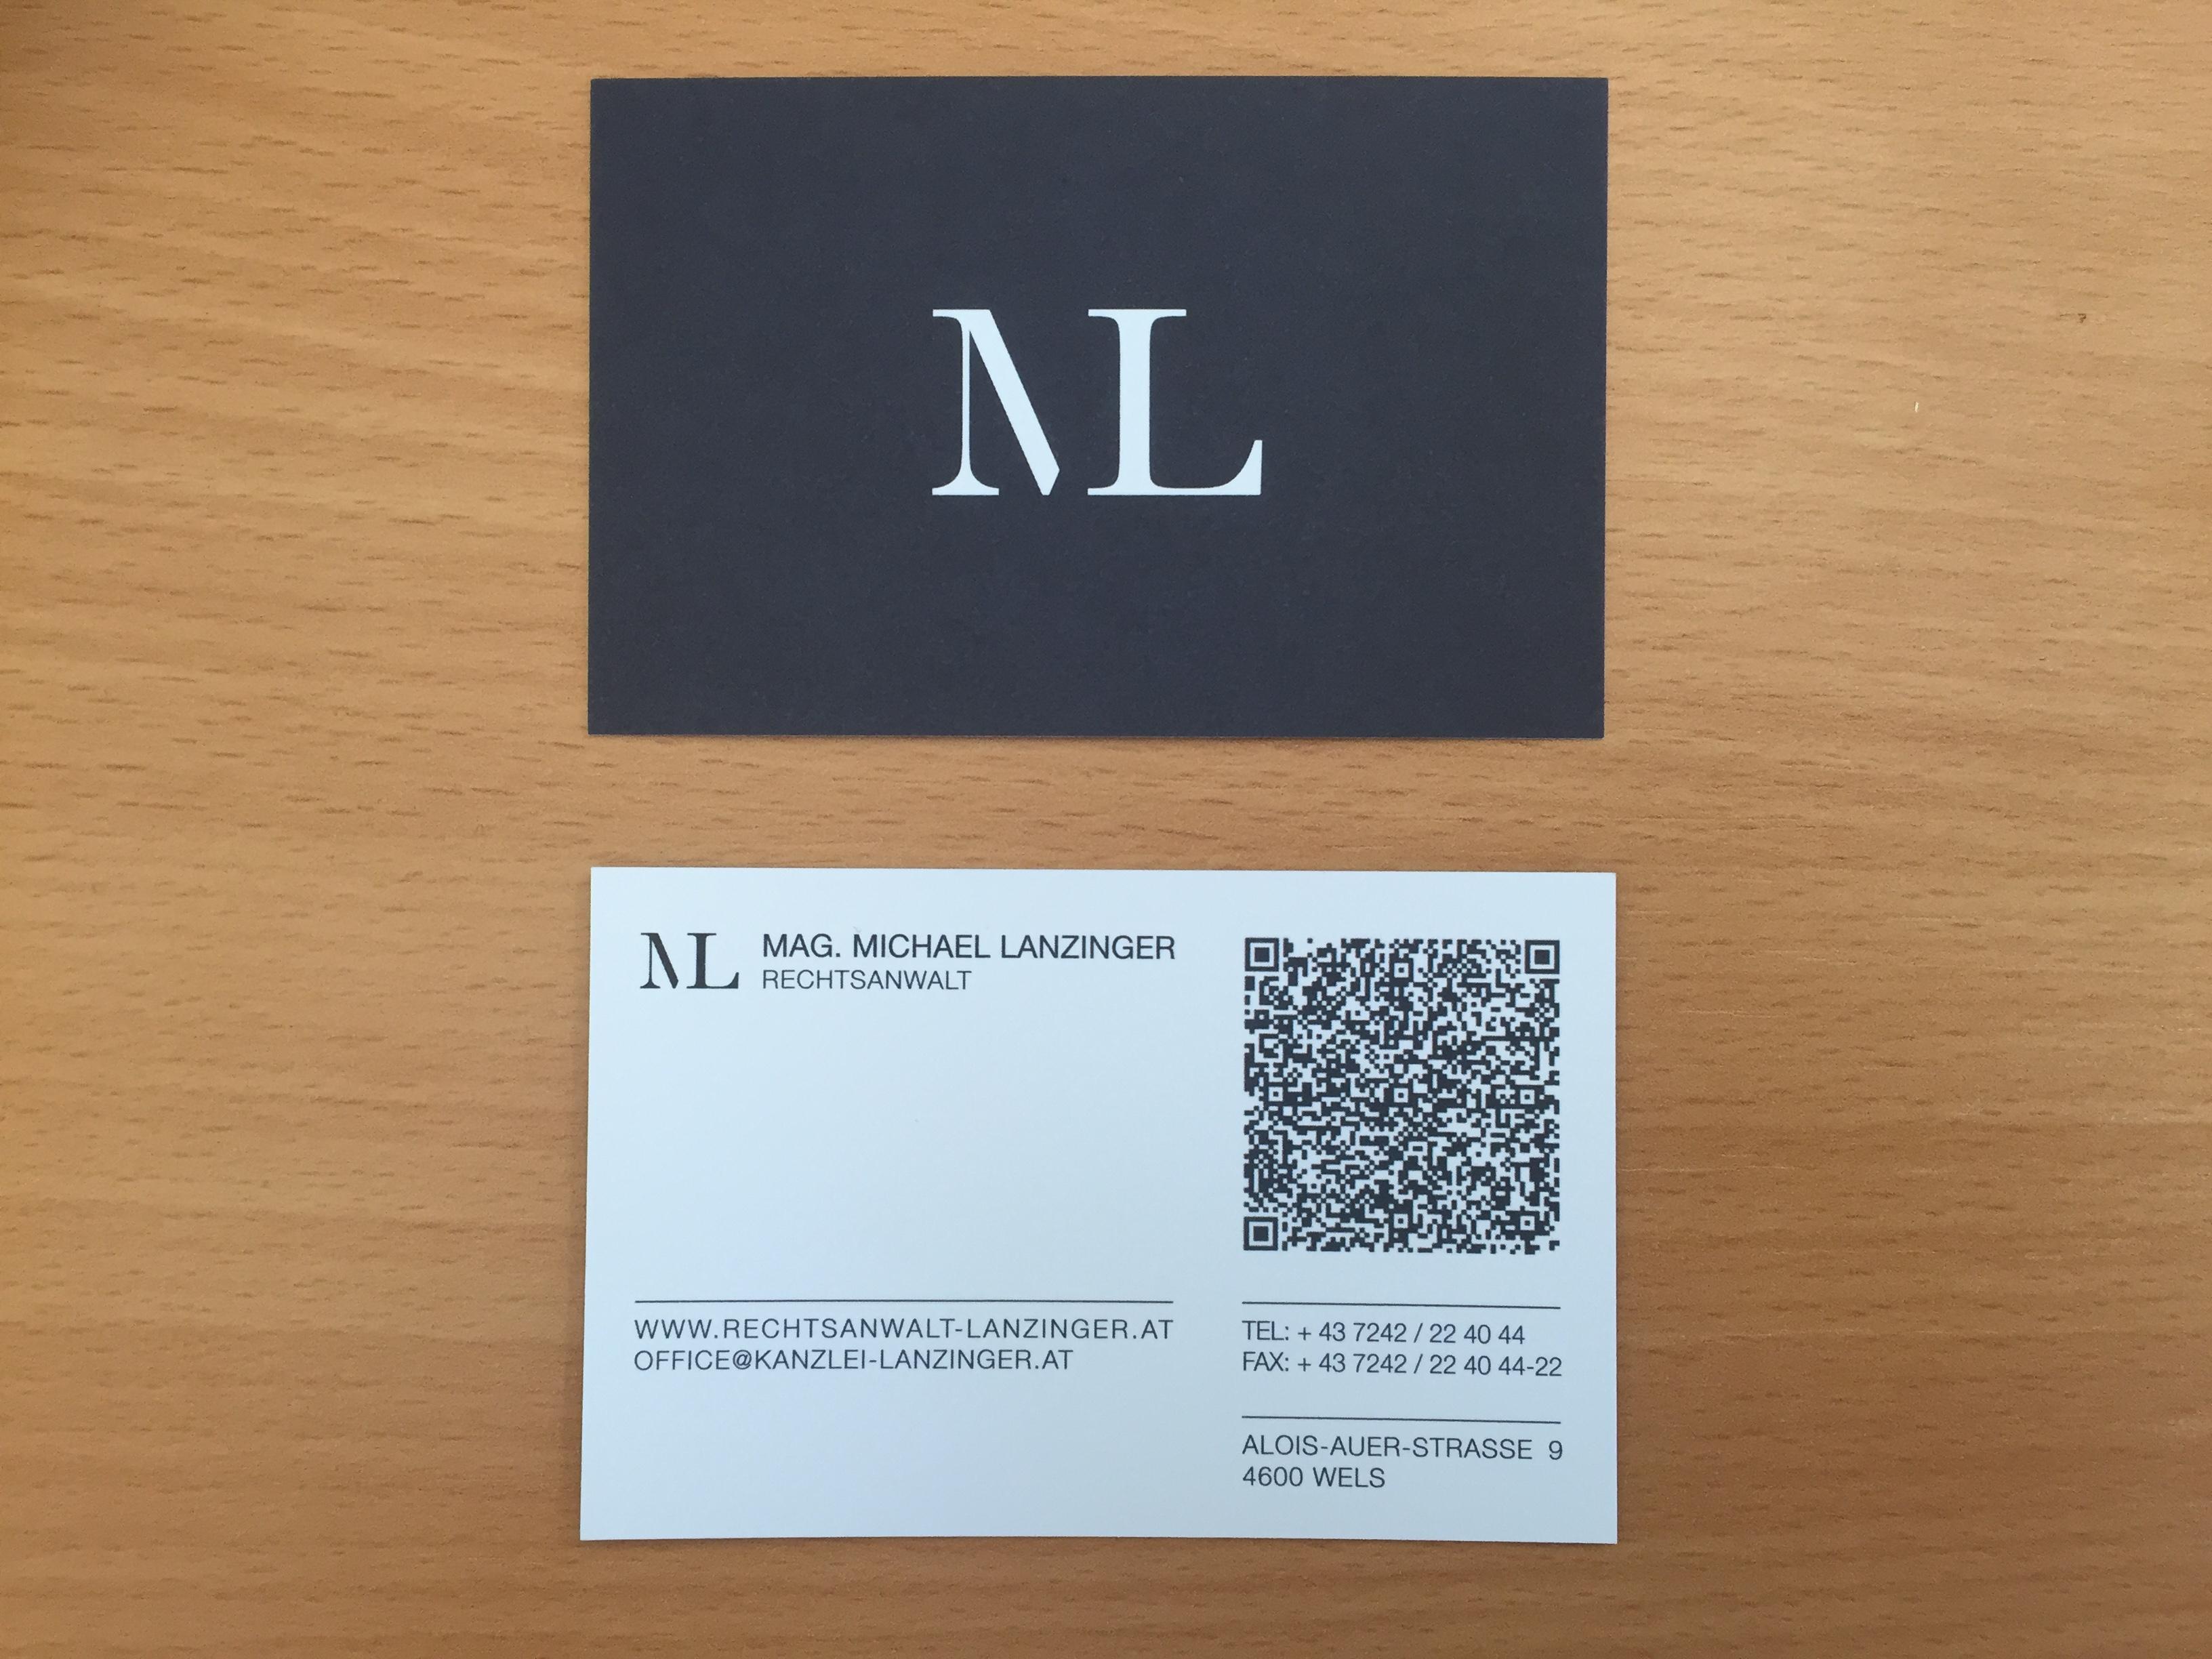 Qr Code Auf Meinen Visitenkarten Rechtsanwalt Lanzinger